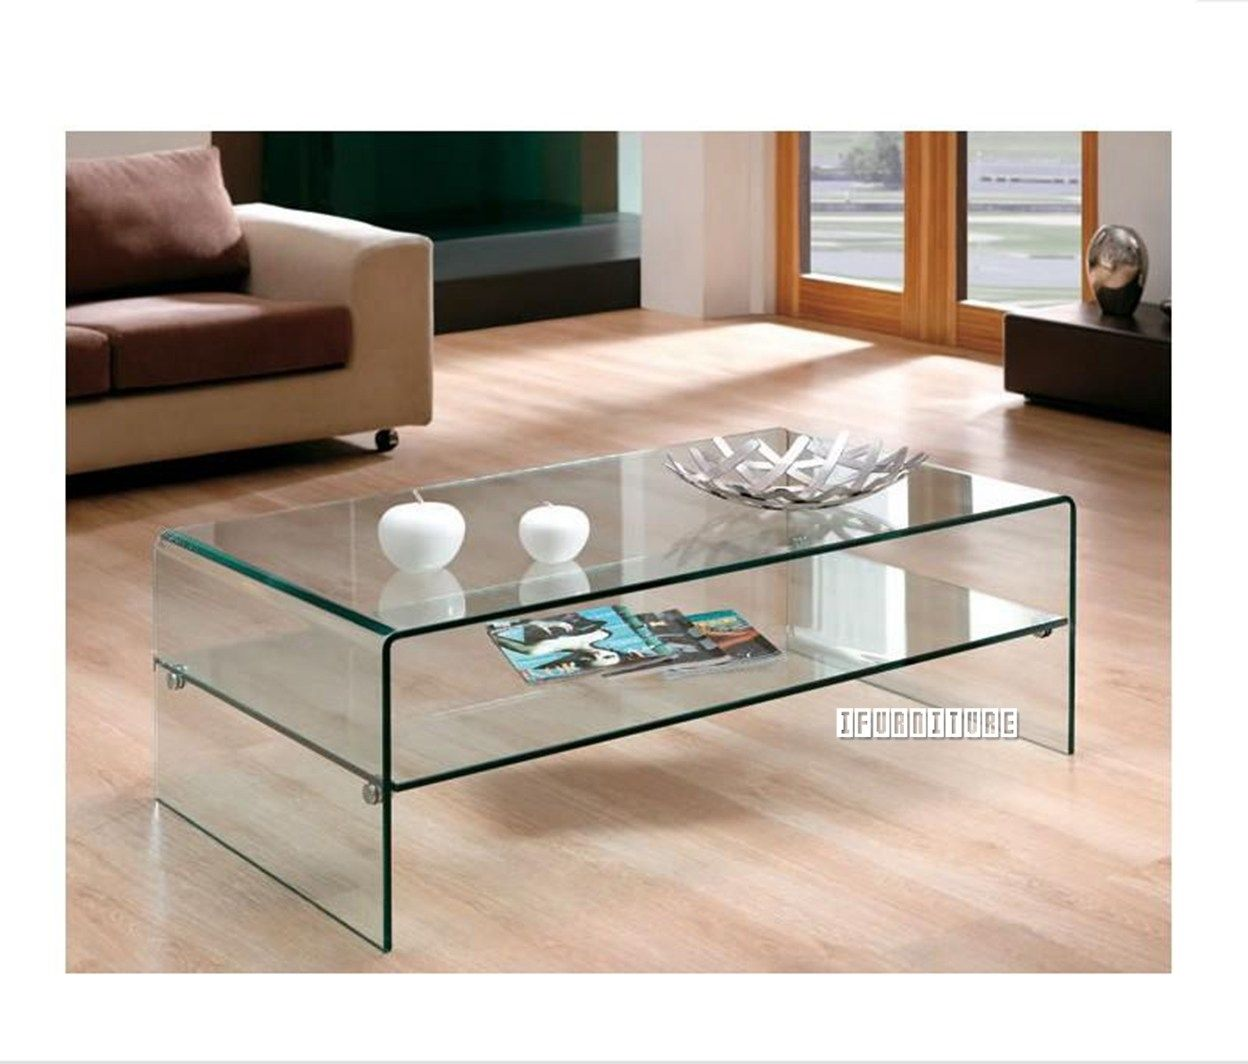 Murano Bent Glass Coffee Table With Shelf Coffee Table Coffee